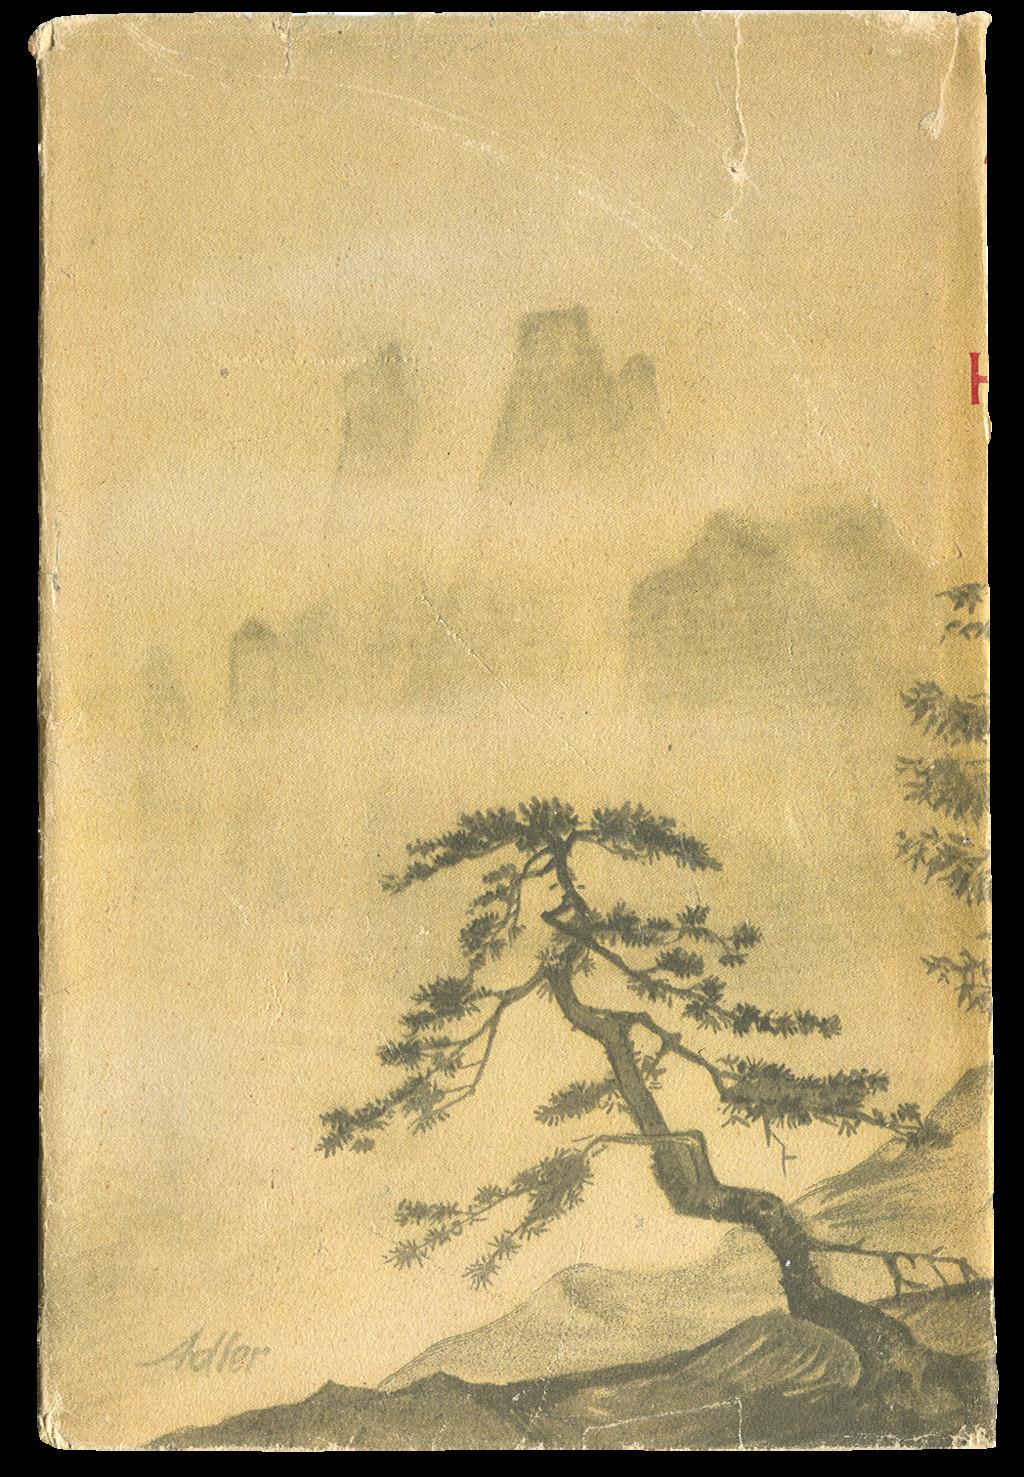 Old Paper Texture Png Old Paper Eastern Landscape